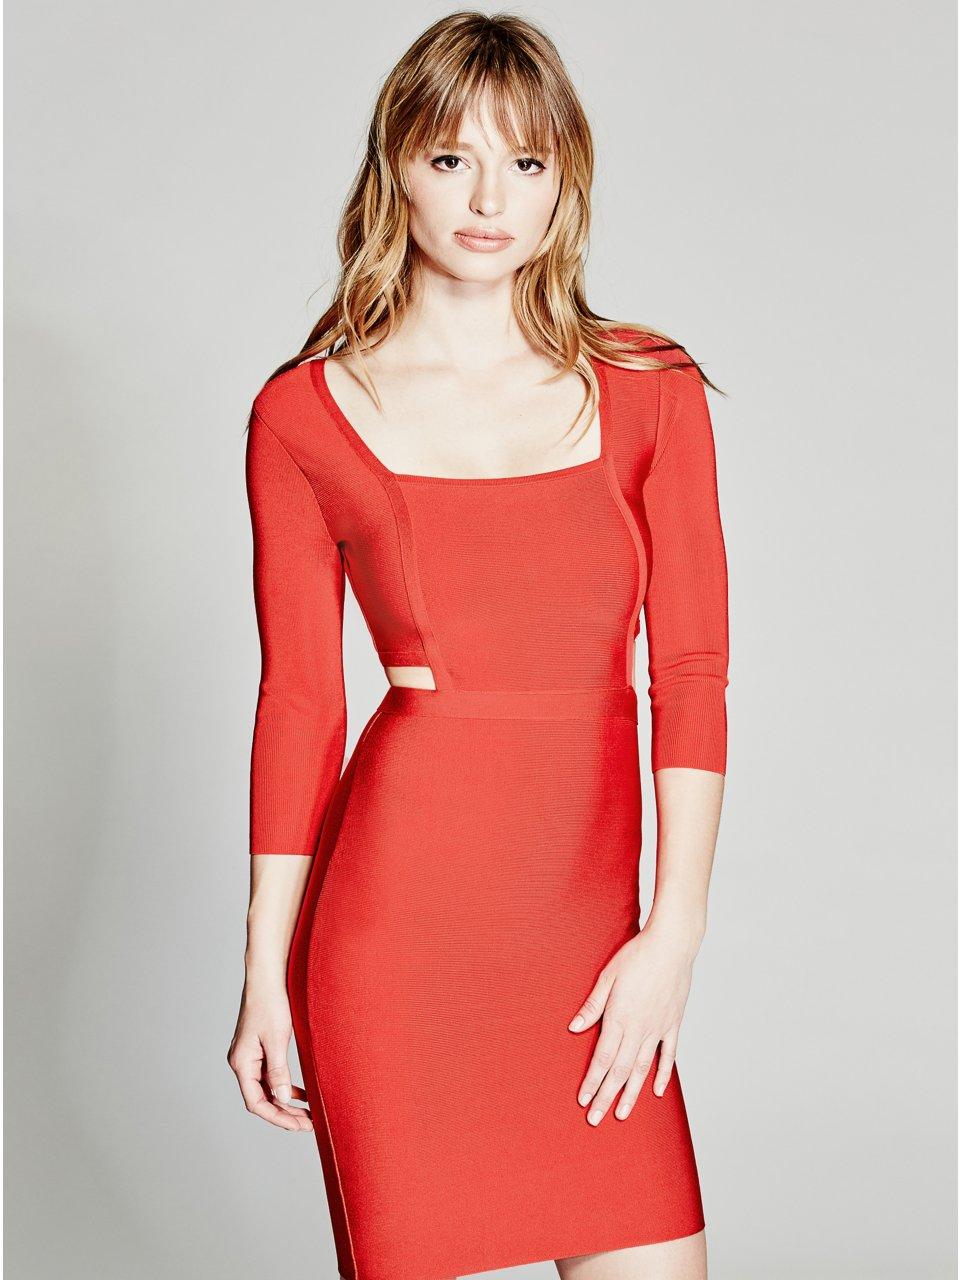 Venus bandage dress products